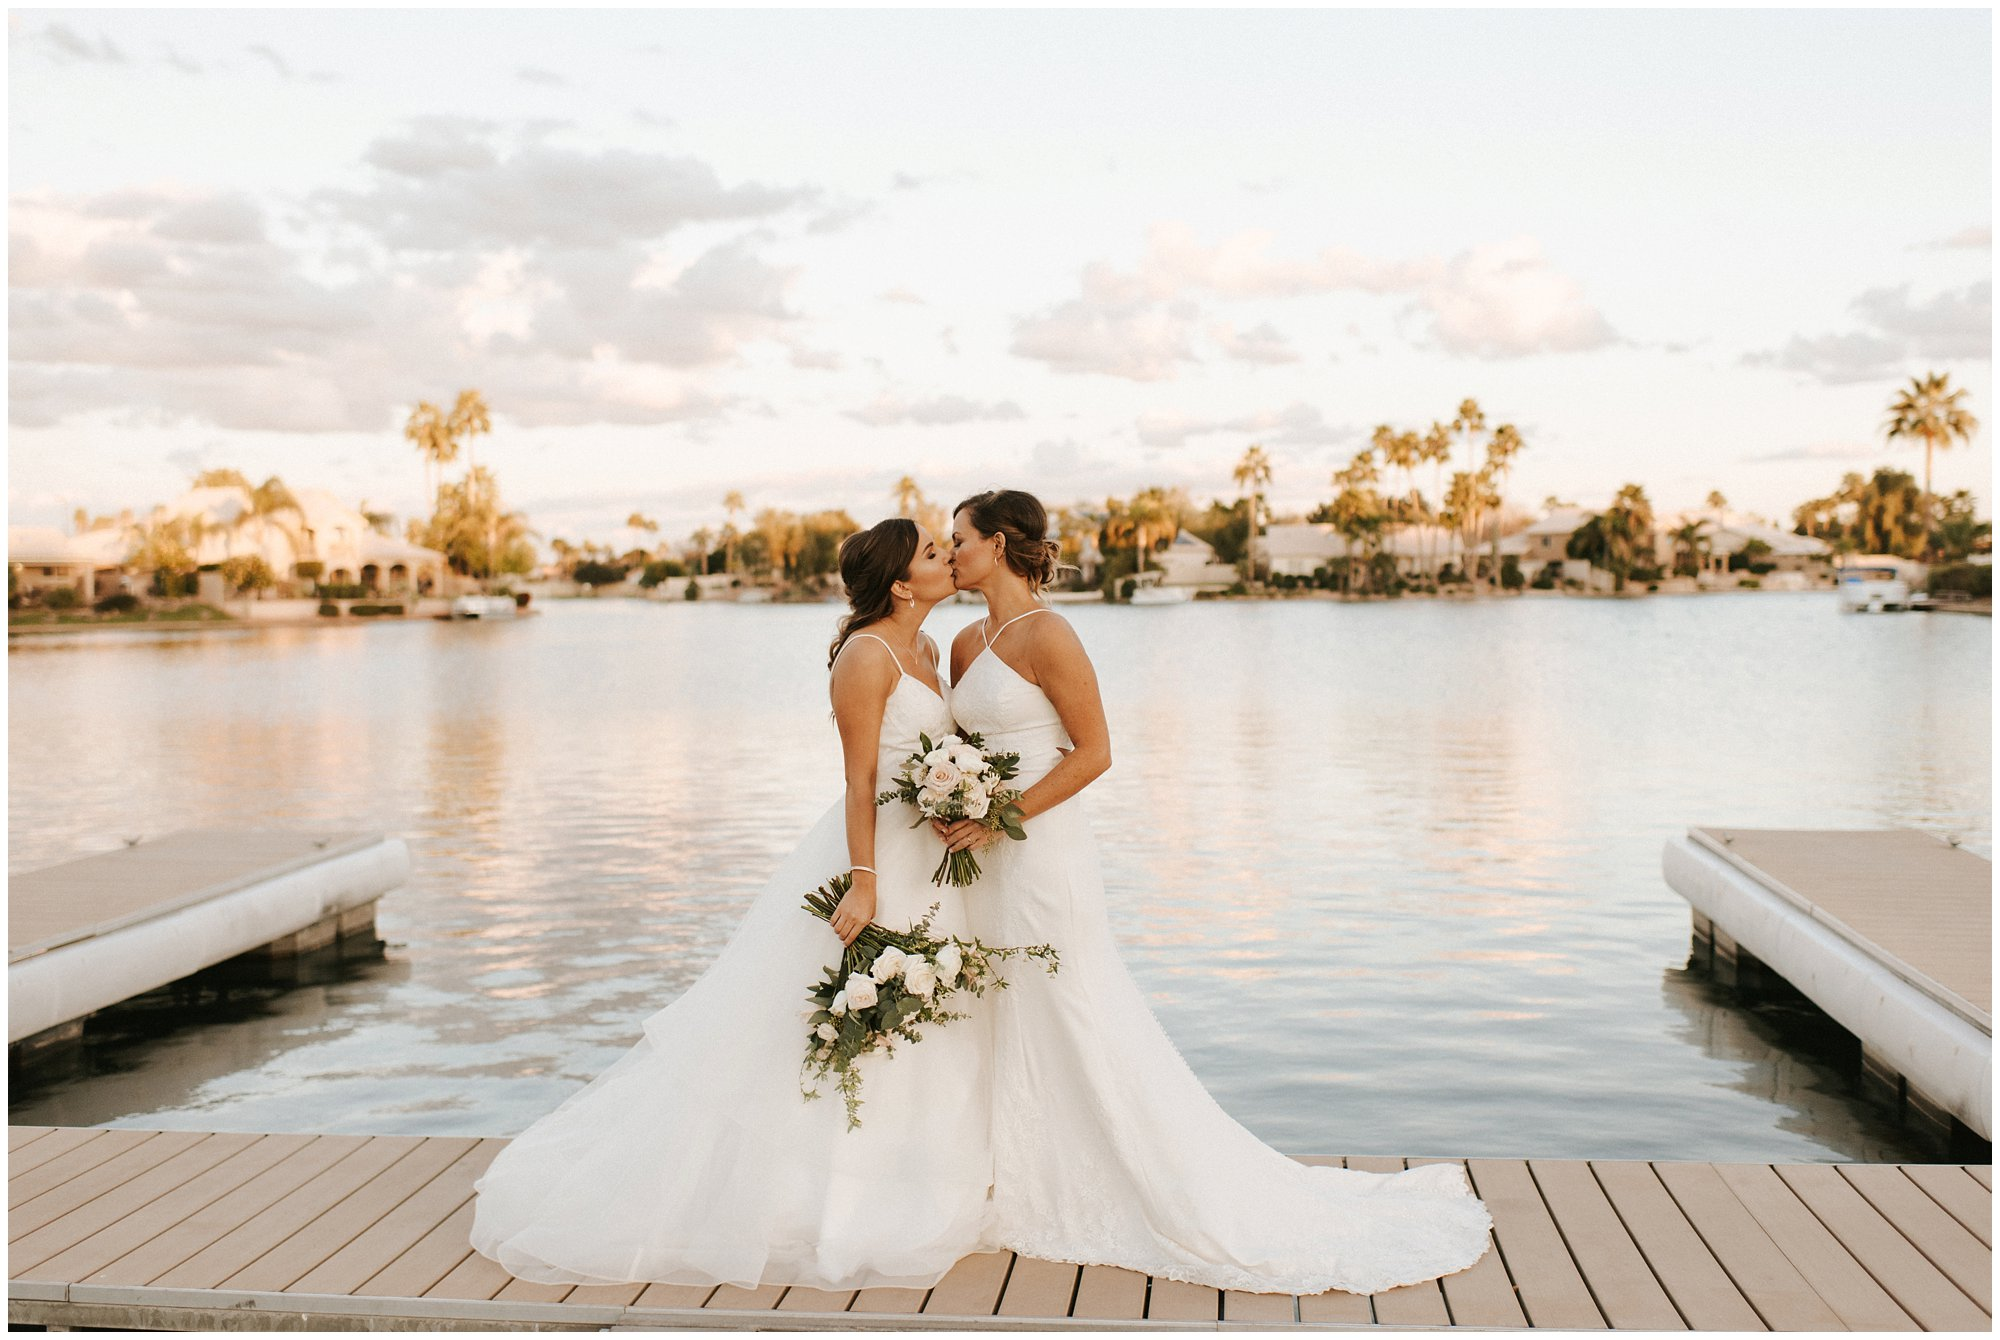 arizona same sex wedding photographer - jenni and lauren wedding the islands clubhouse_0091.jpg